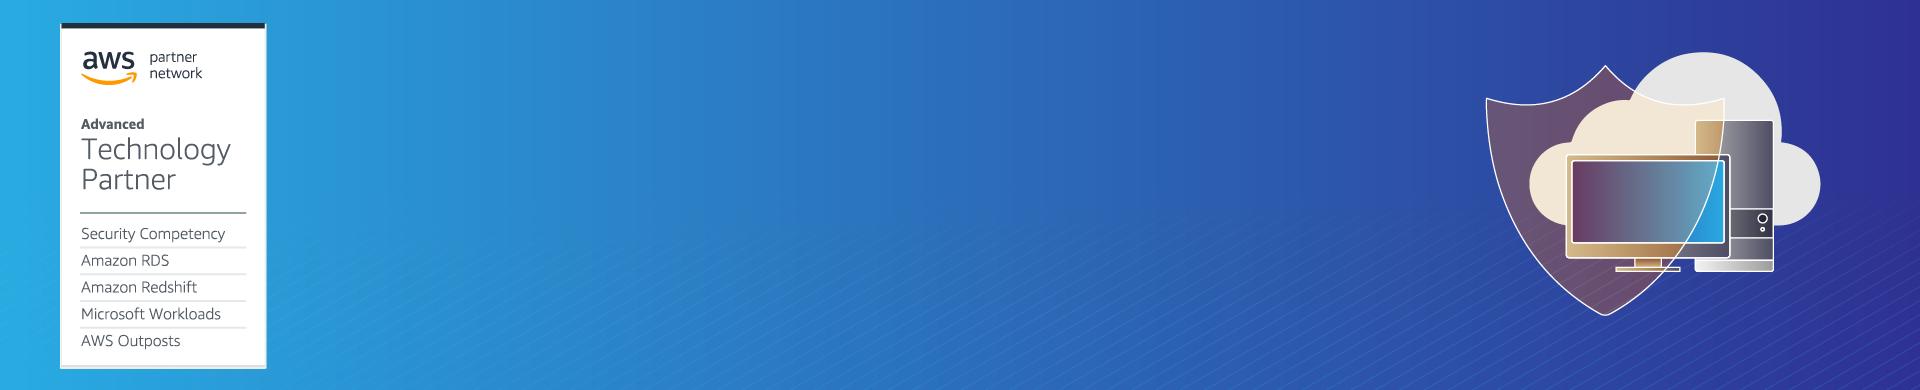 DataSunrise, Inc. Achieves AWS Outposts Ready designation